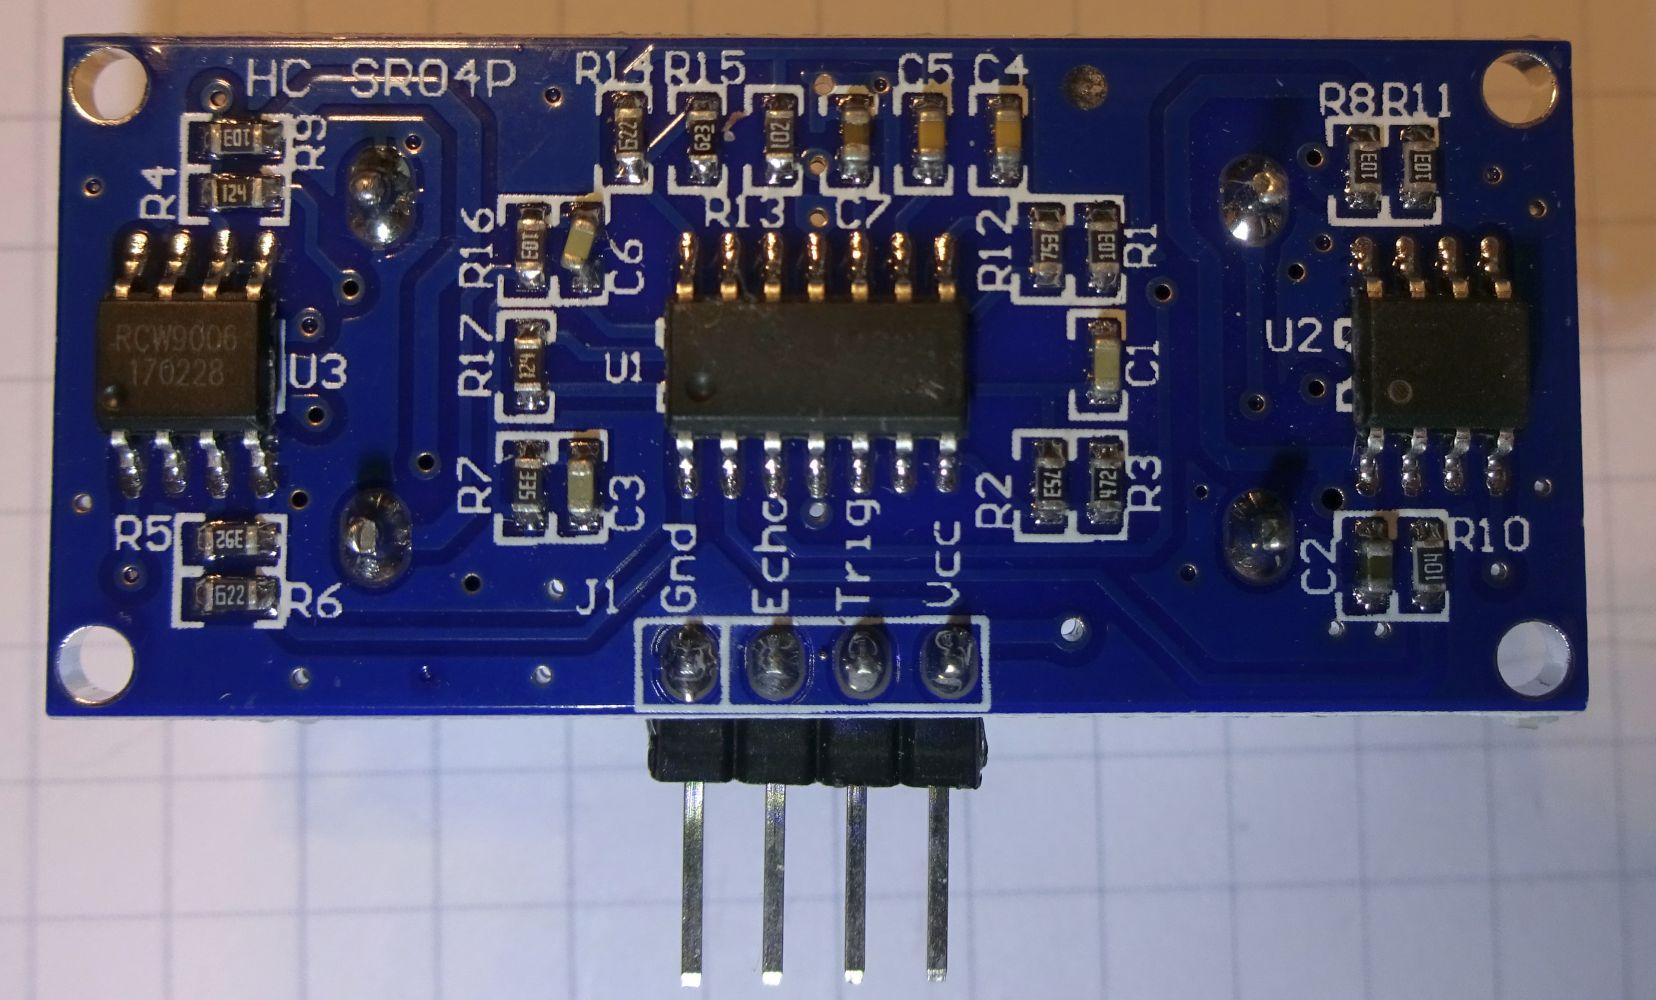 Ultraschall Entfernungsmesser Hc Sr04 : Arduino ultraschall abstandswarner mit dem multi function shield